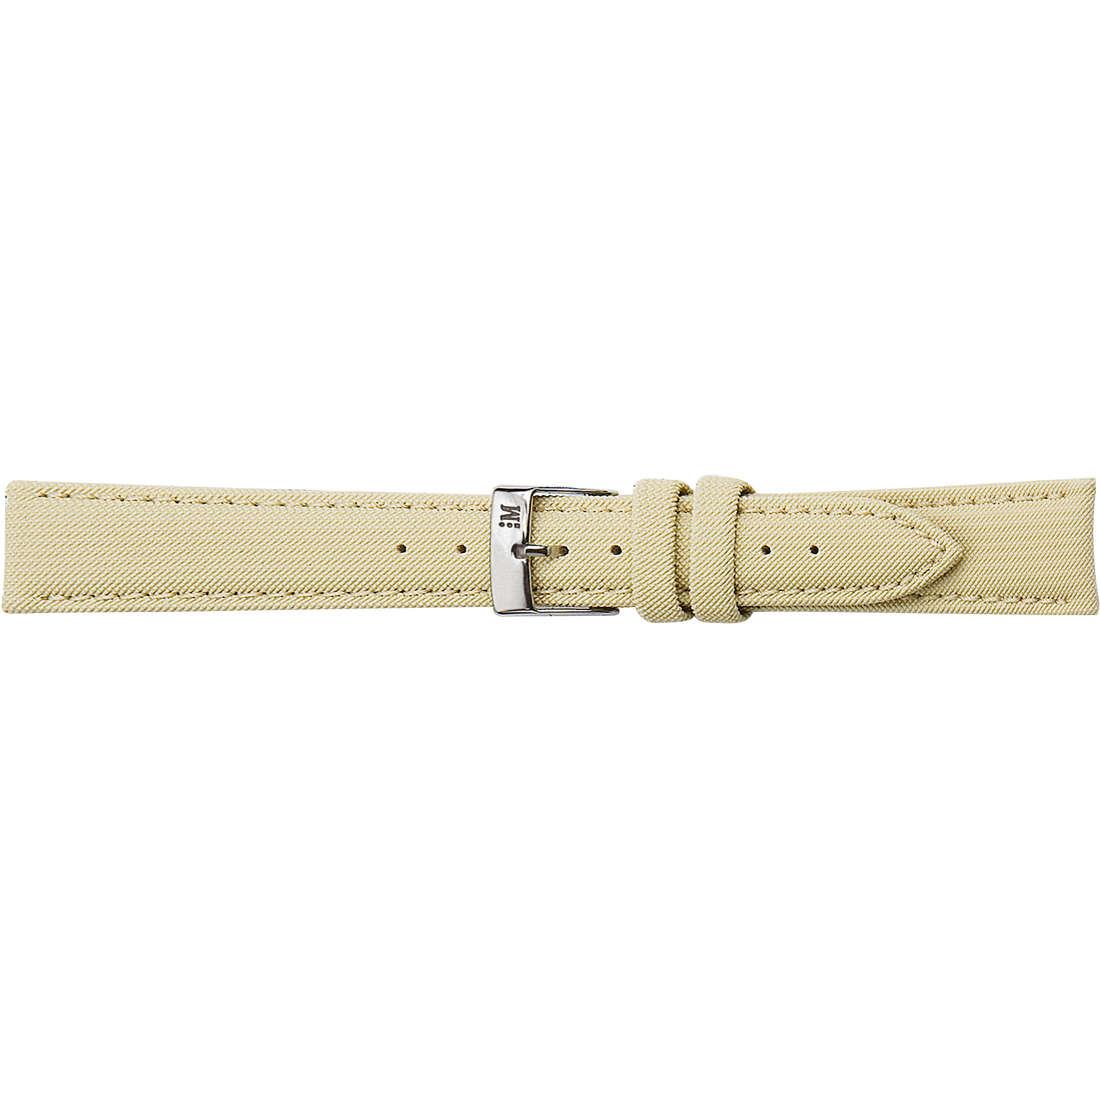 watch watch bands watch straps man Morellato Linea Sport A01X2778841027CR20